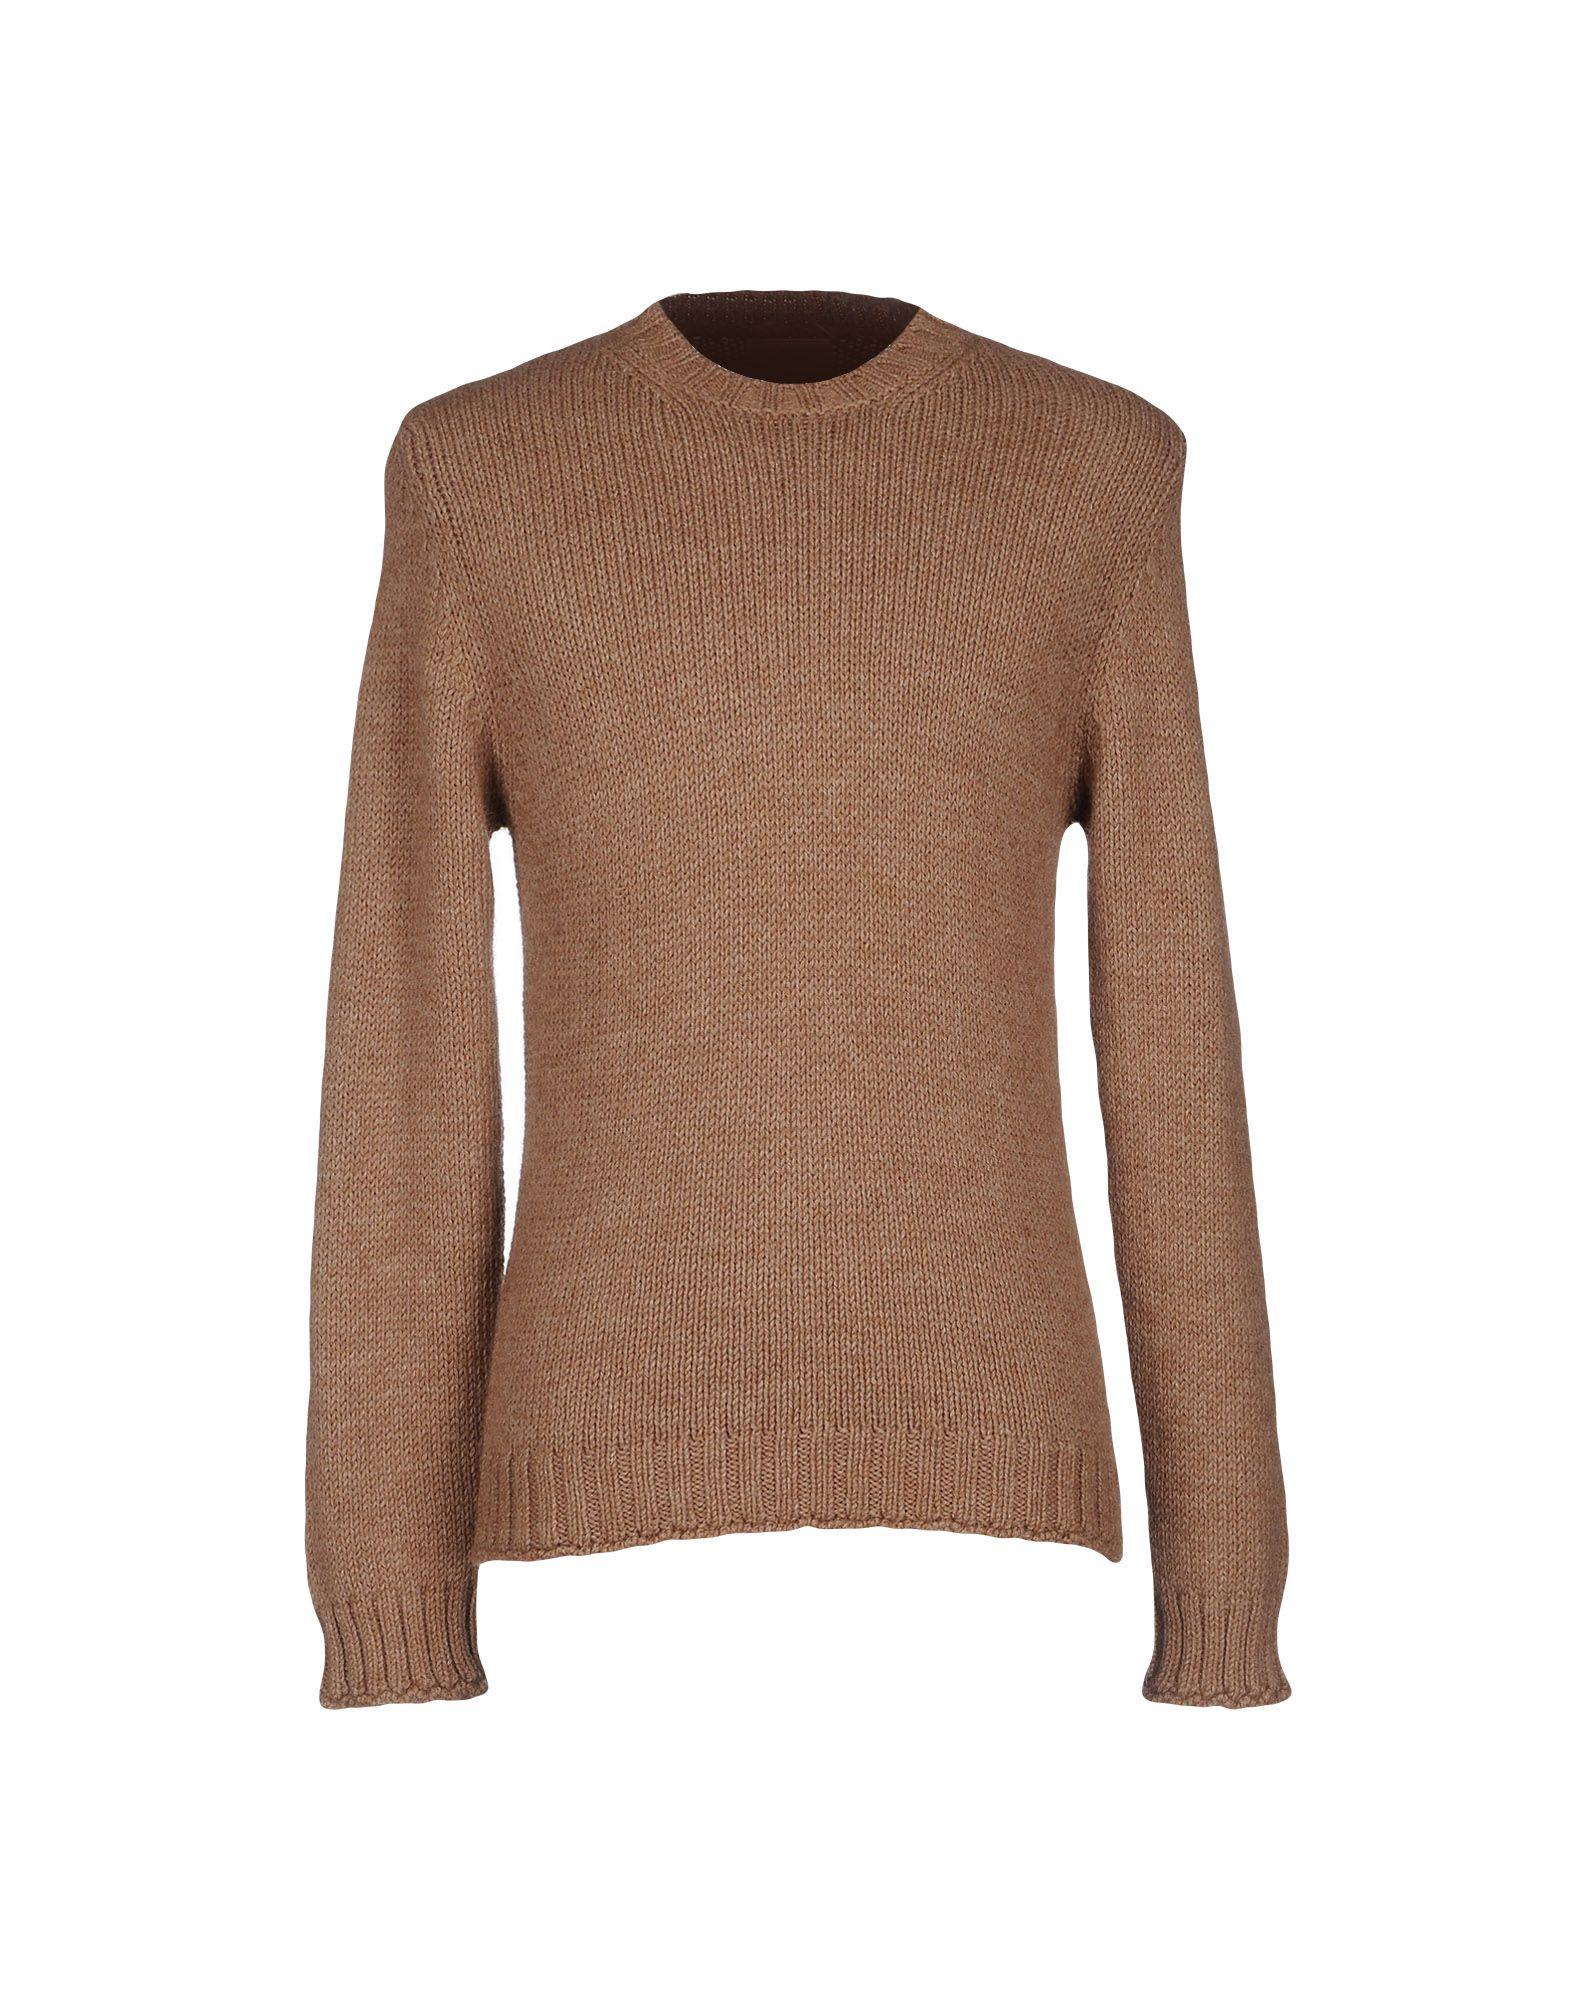 ФОТО casa - isaac свитер